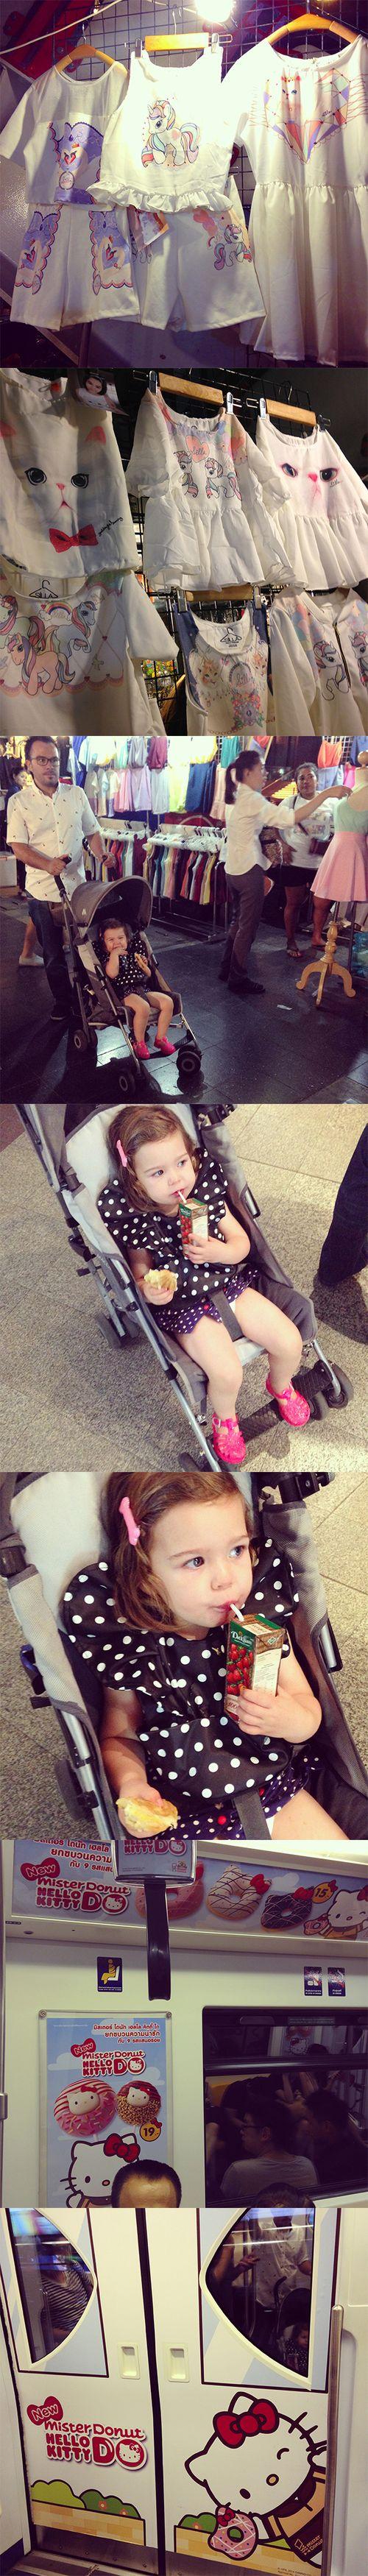 Bangkok-voyage-famille-pimpandpomme-thailande-33